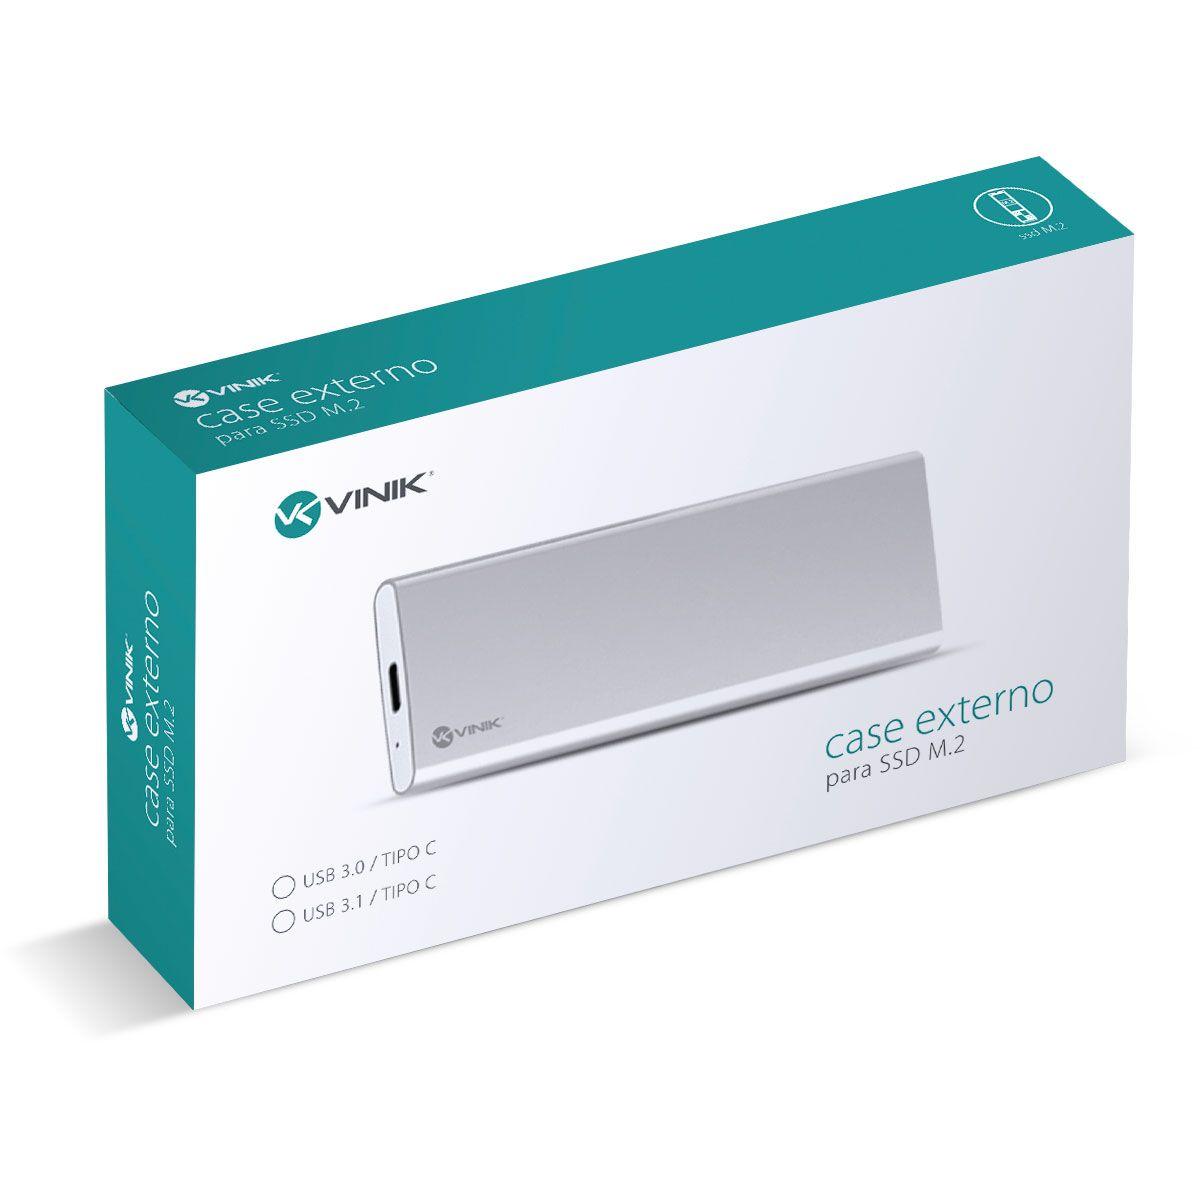 "CASE EXTERNO PARA SSD 2.5"" CONEXÃO USB 3.0 PARA SATA - USB TIPO C PARA USB - CS25-C30 vinik"